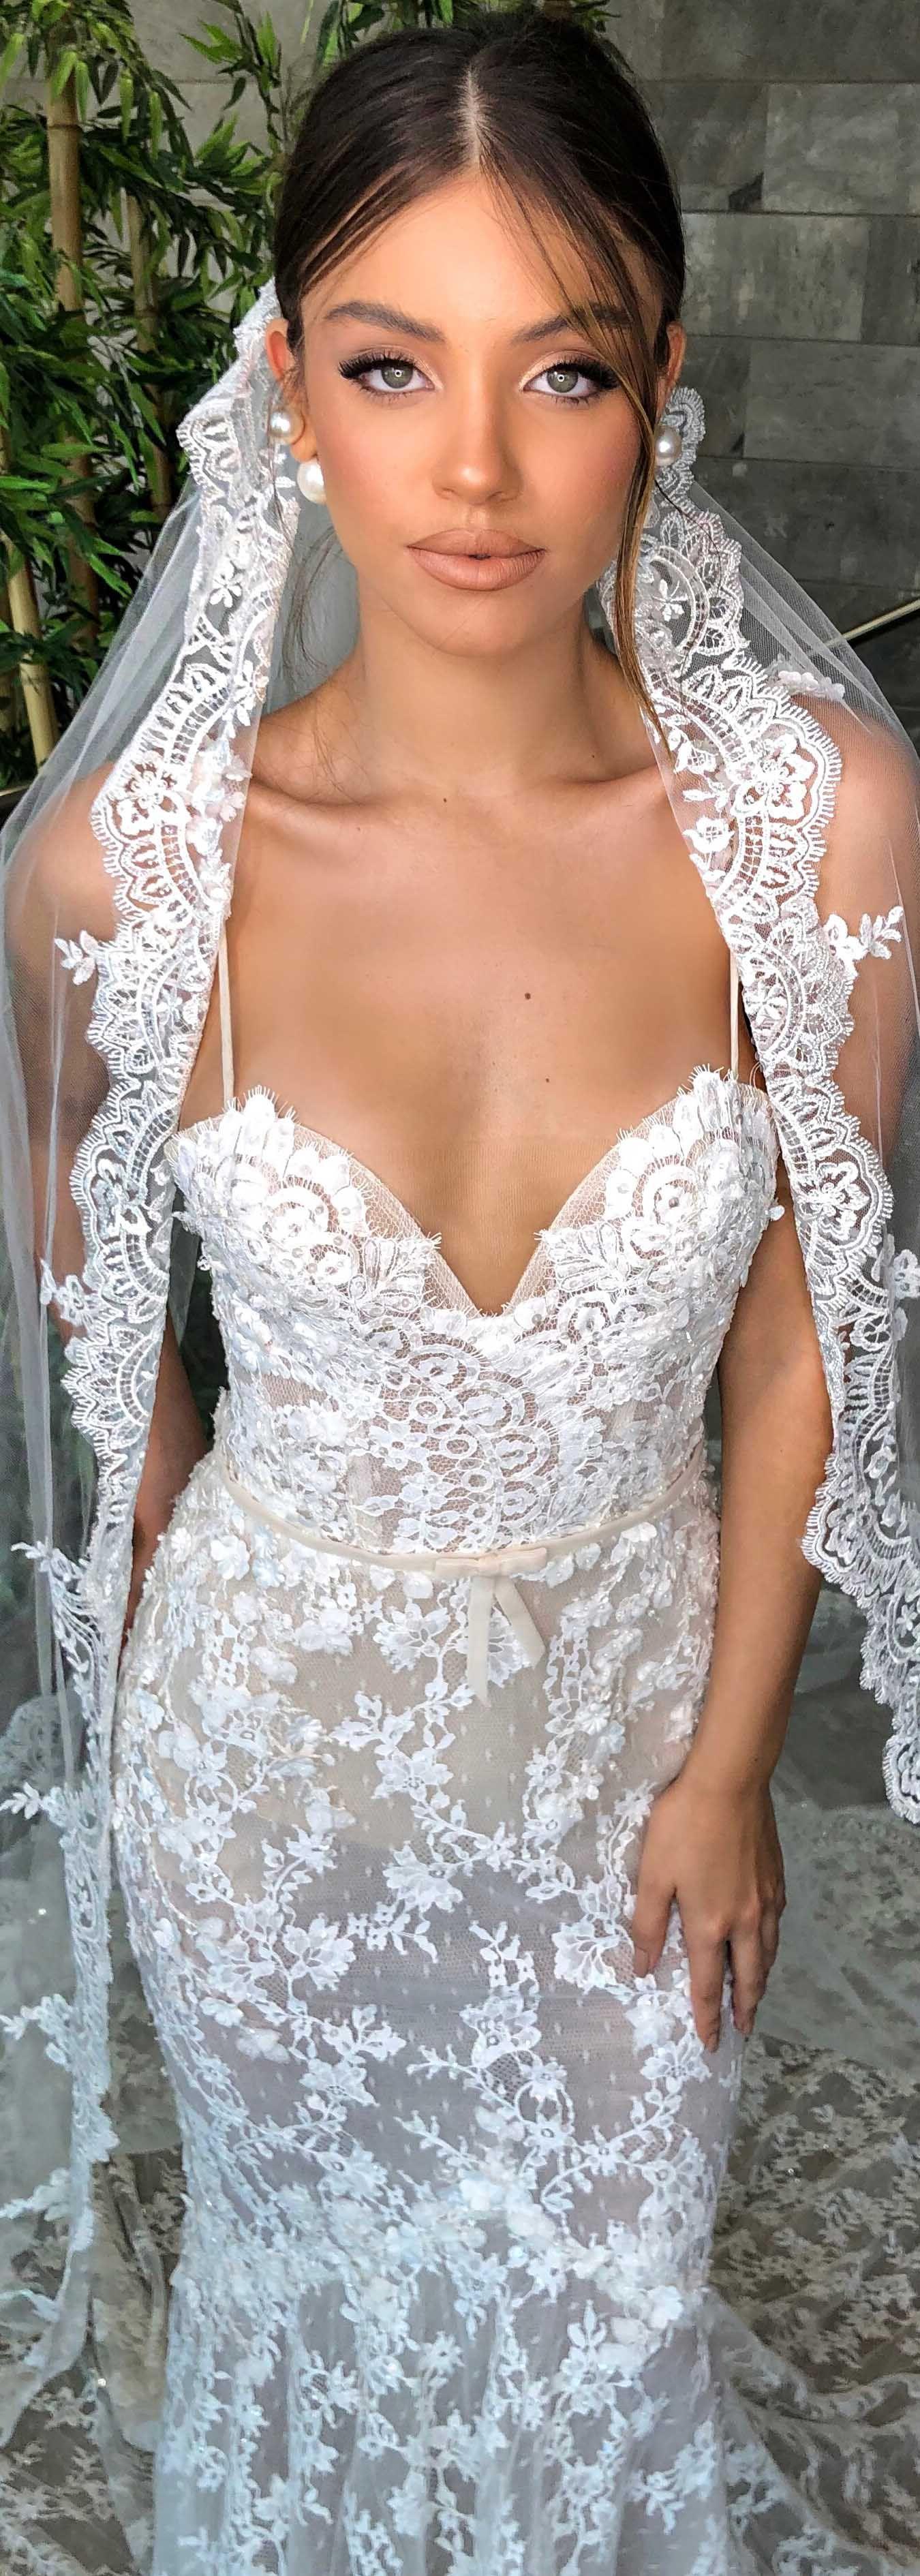 23+ Wedding dress with veil and tiara ideas